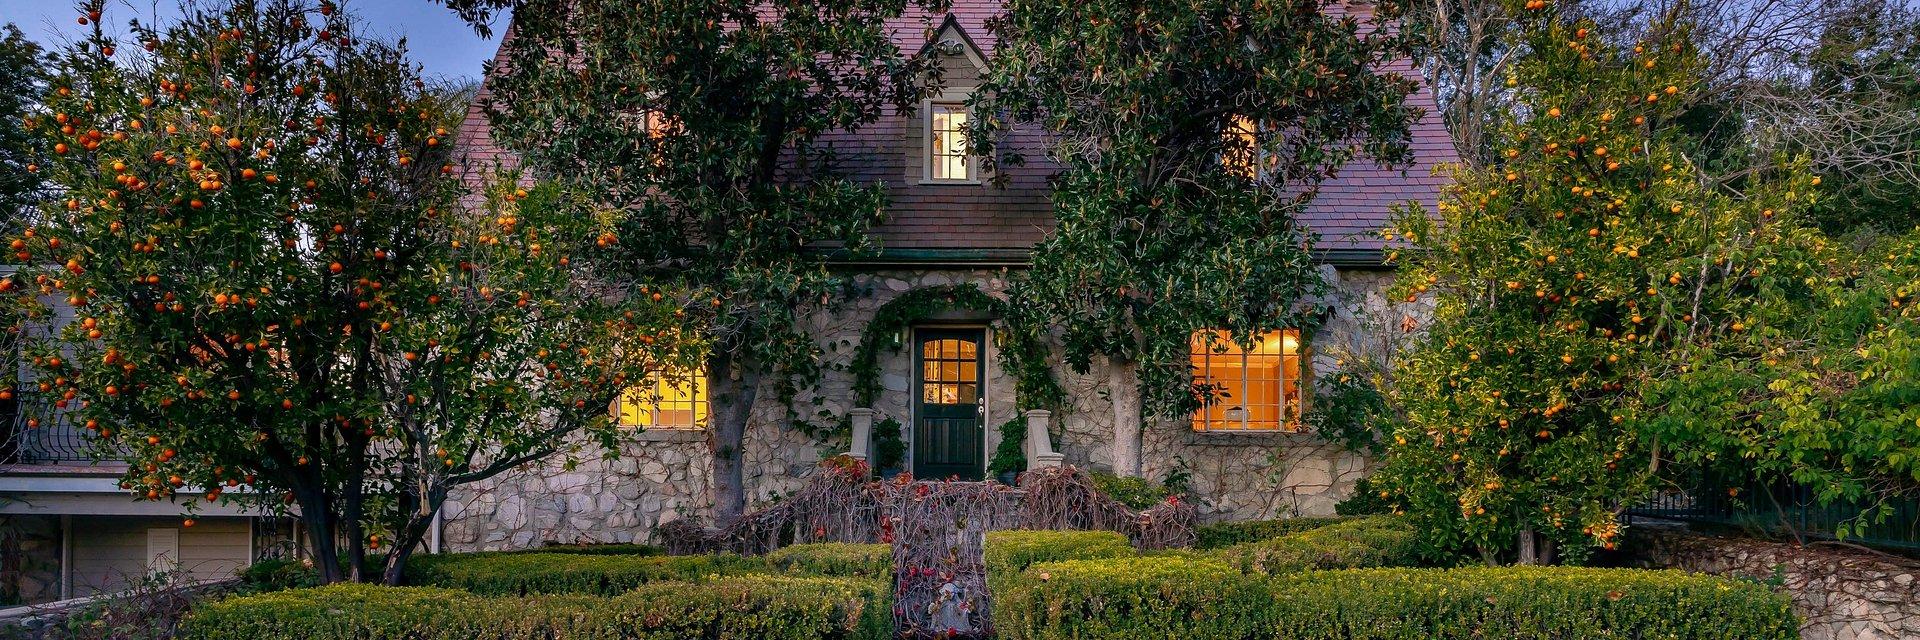 Coldwell Banker Residential Brokerage Lists La Cañada Flintridge Property for $2.395 Million